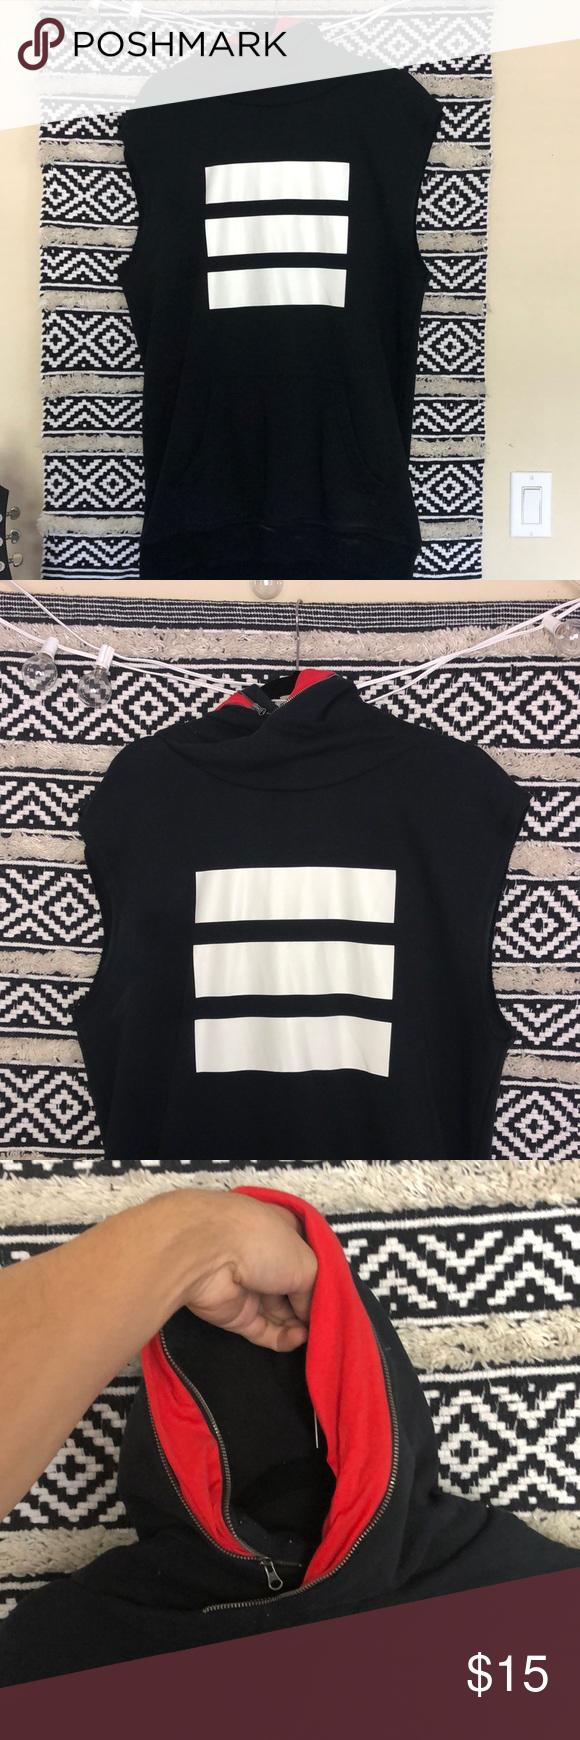 Adidas Oversized Hoodie Pacsun Oversize Hoodie Adidas Three Stripes Sweatshirt Shirt [ 1740 x 580 Pixel ]